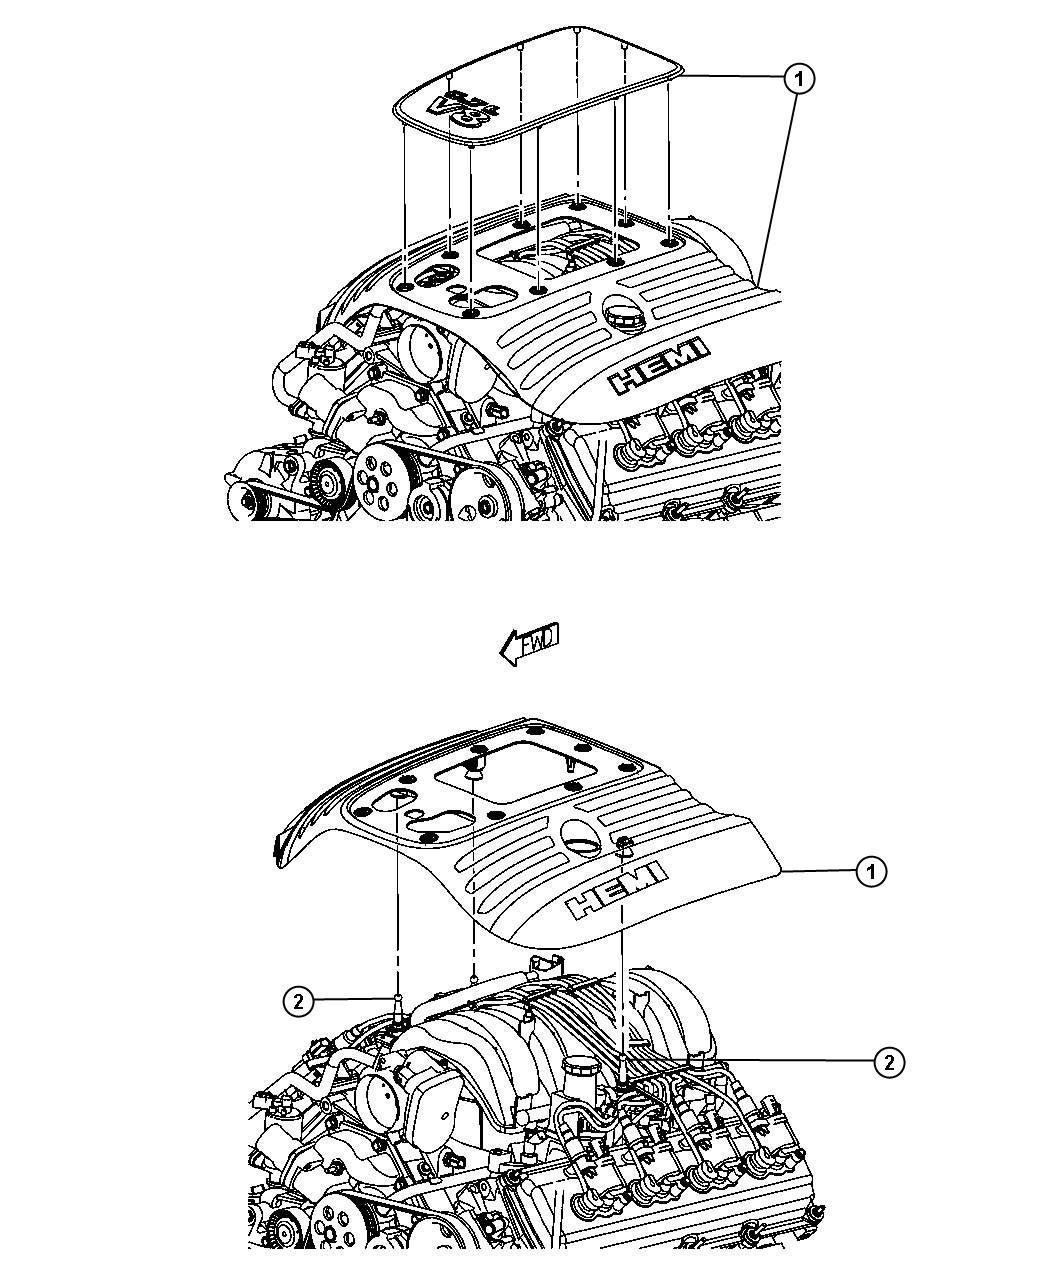 2013 Dodge Charger Cover. Engine. Upper. Markings, logo